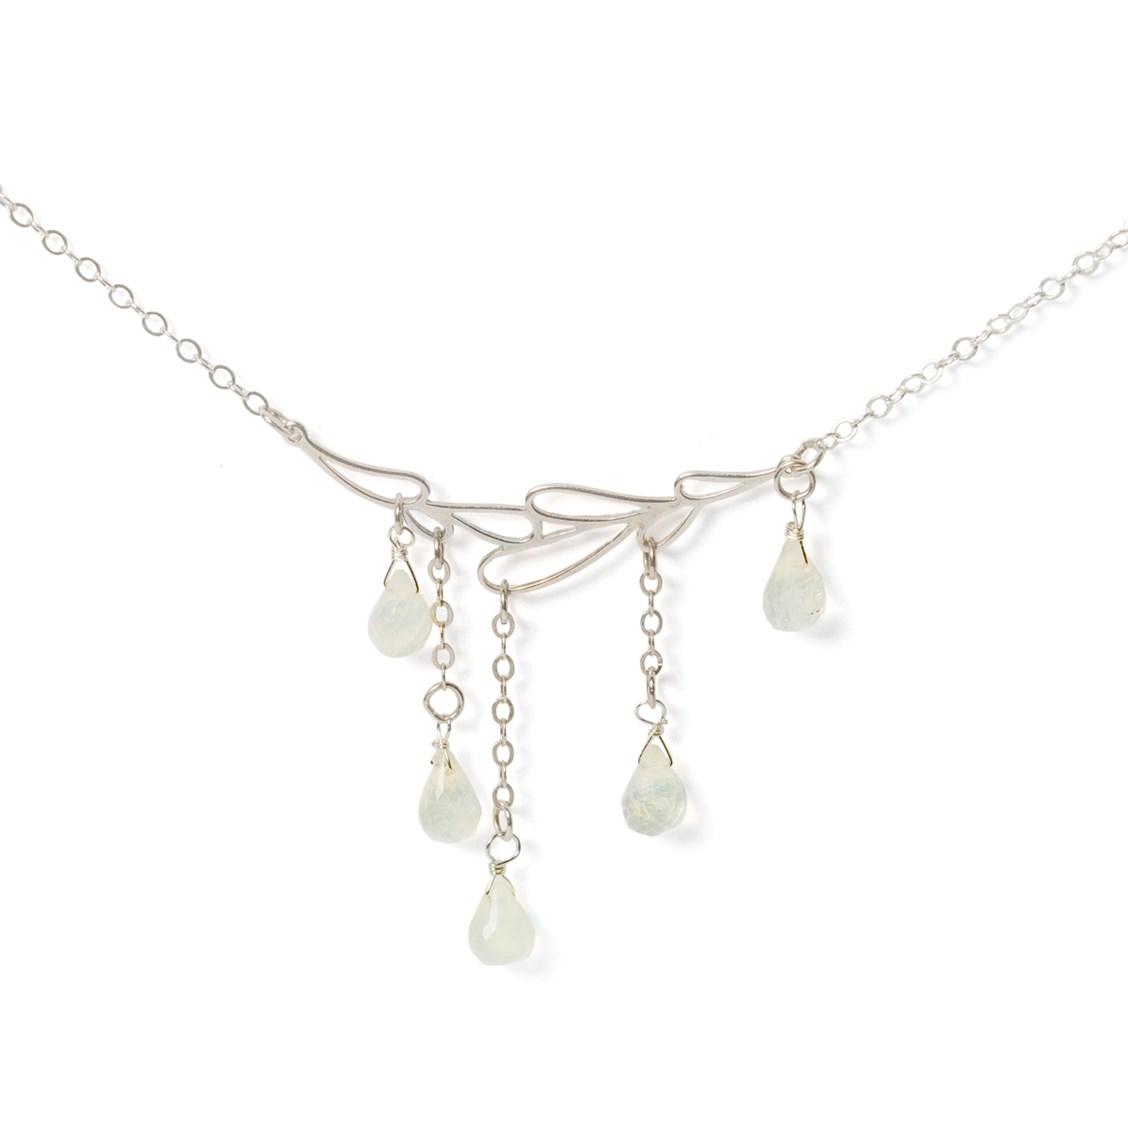 Raindrop Necklace